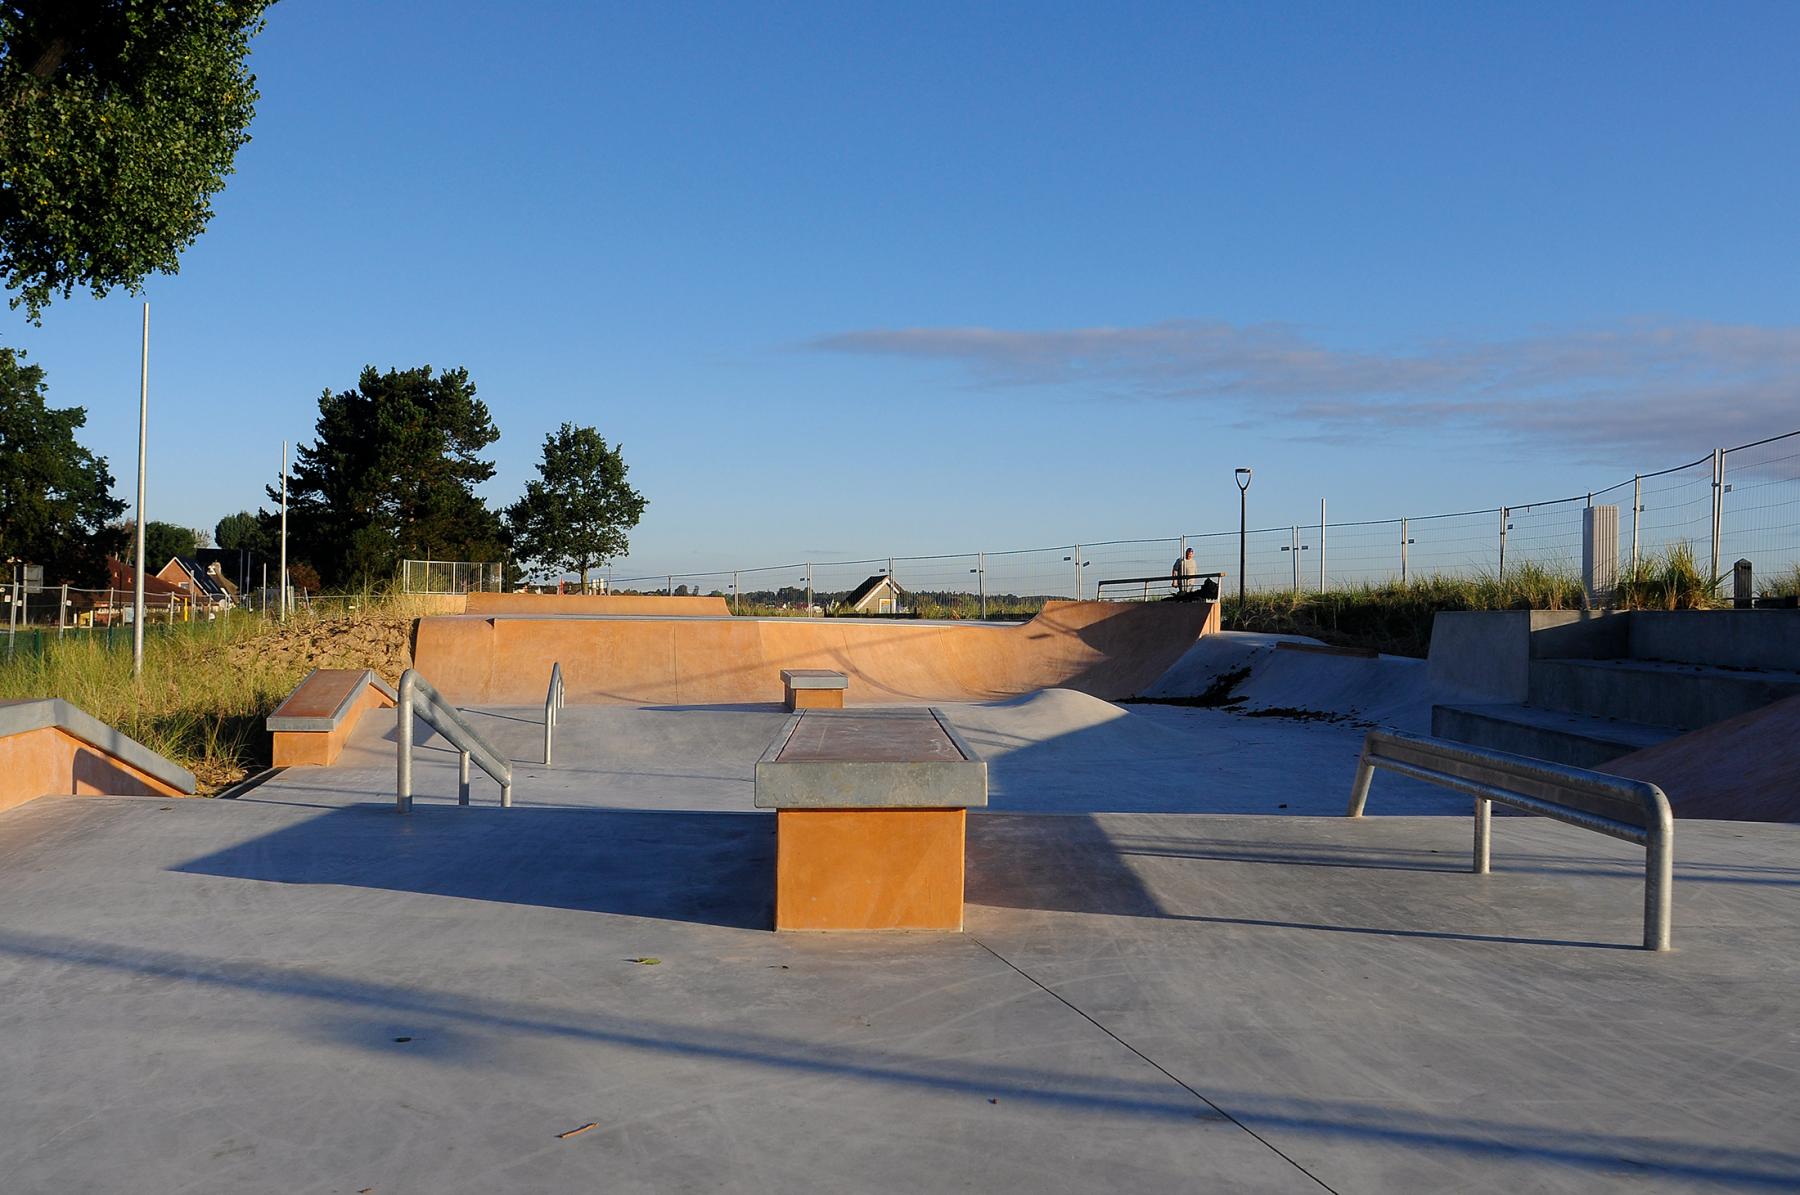 ML_Skatepark_Scharbeutz_12